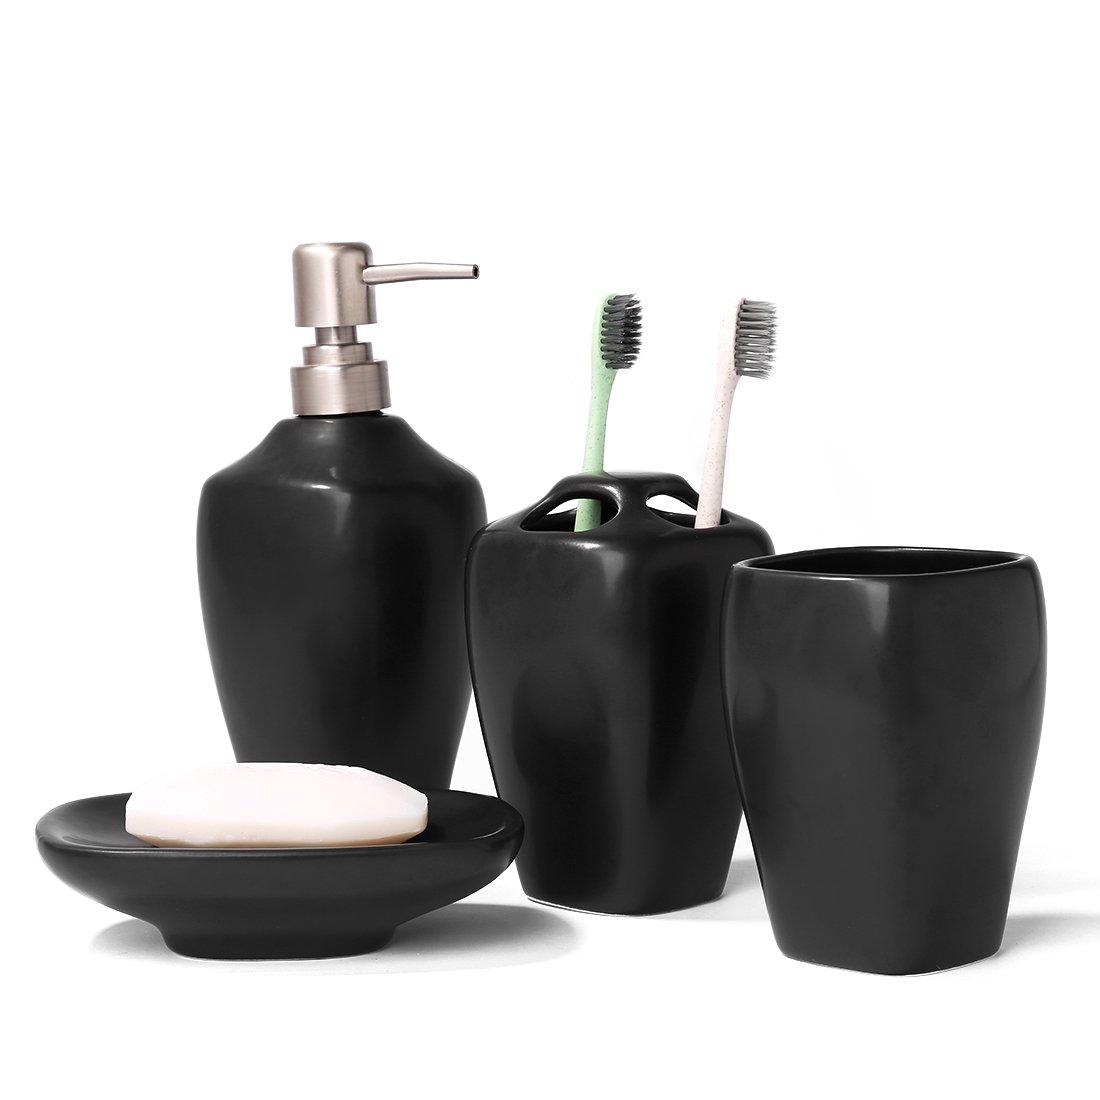 Details About FORLONG FL3013 Black Mate Ceramic Bathroom Accessories Set Of  4:1 Gargle Cups,1